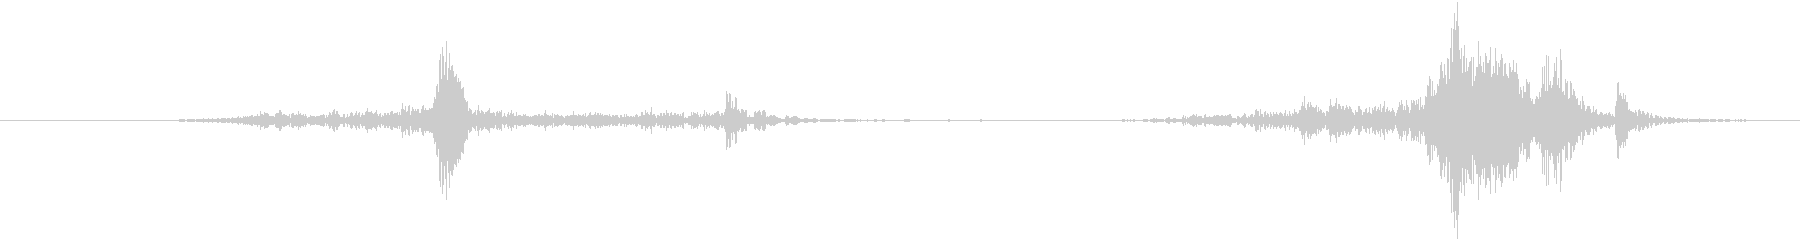 Addressograph:スライ...の未再生の波形